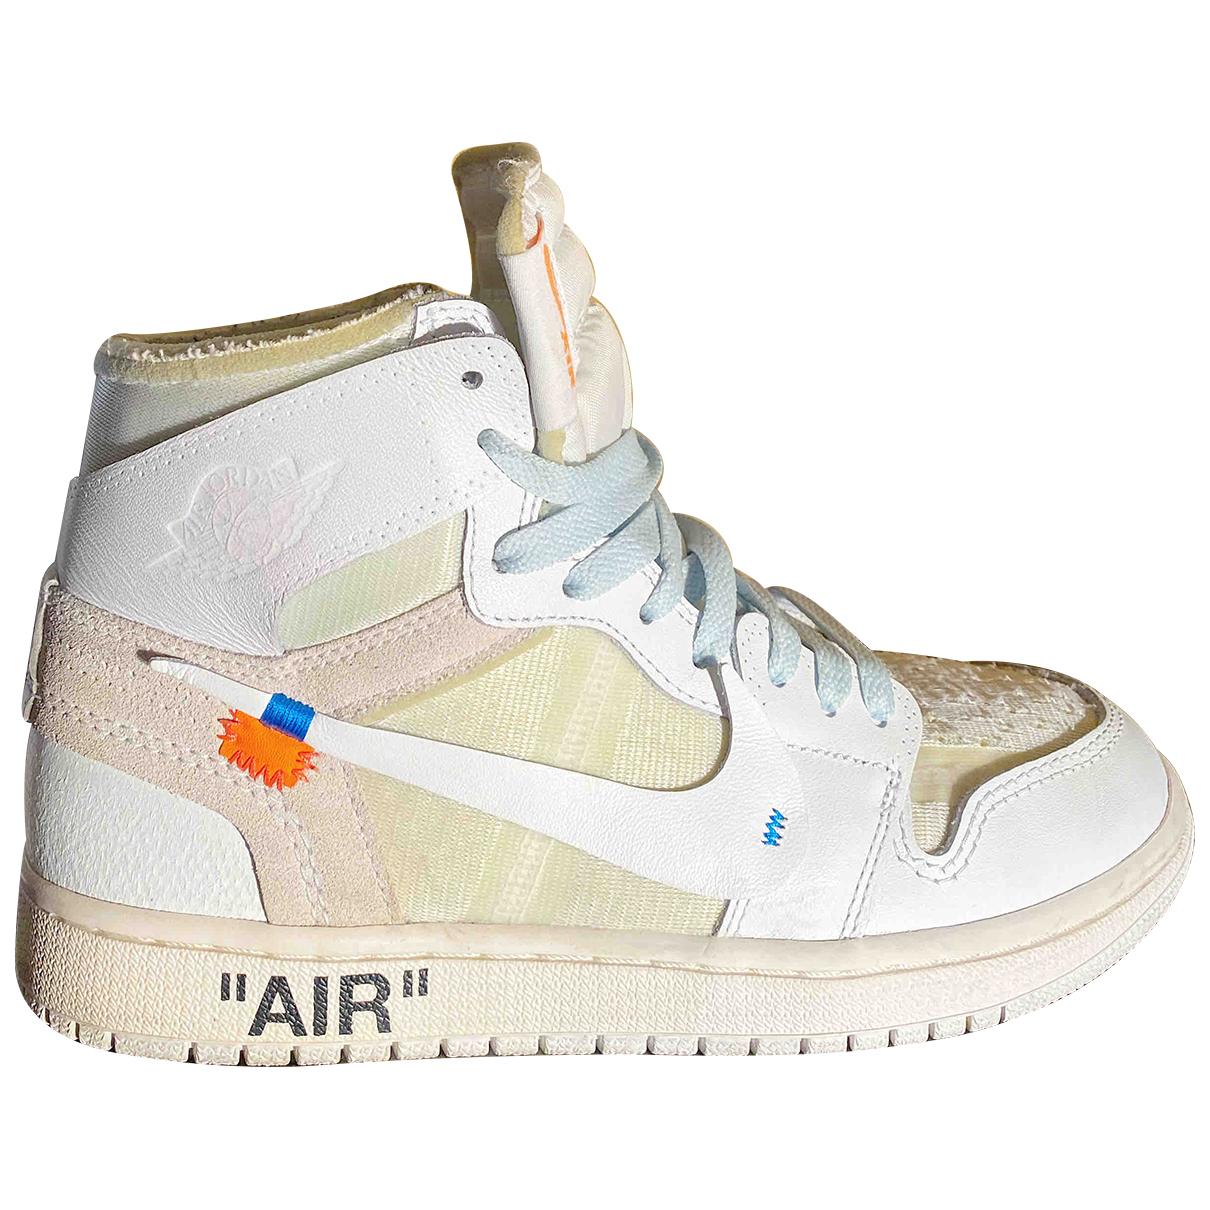 Deportivas Air Jordan 1 de Cuero Nike X Off-white